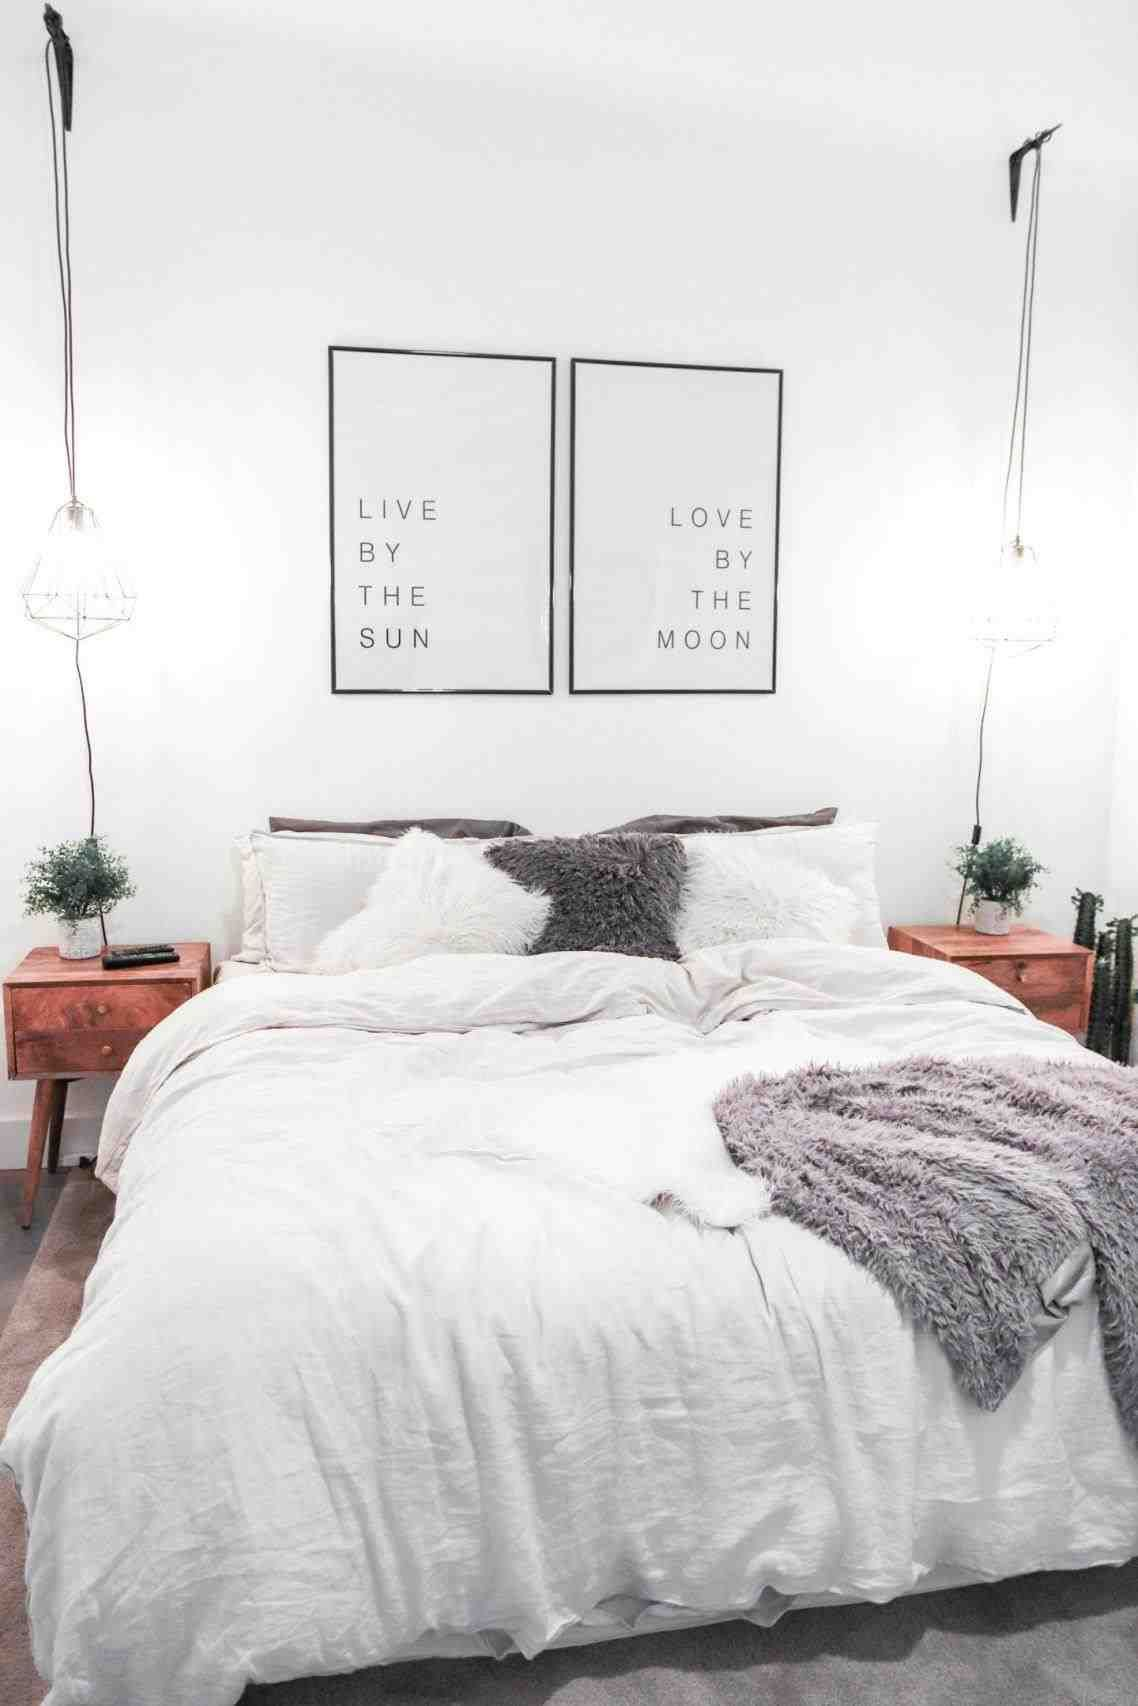 23 Fantastic Boho Chic Master Bedroom Decortez Apartment Bedroom Design Home Bedroom Apartment Bedroom Decor Master bedroom apartment ideas